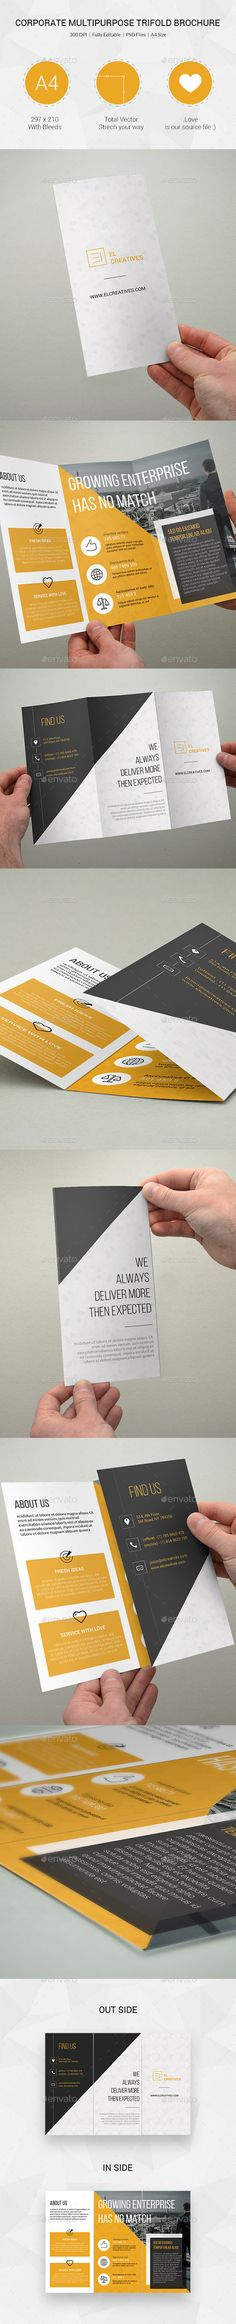 Corporate Multipurpose Trifold Brochure - 12 - Corporate Brochure Template PSD. Download here: http://graphicriver.net/item/corporate-multipurpose-trifold-brochure-12/12071622?s_rank=1707&ref=yinkira